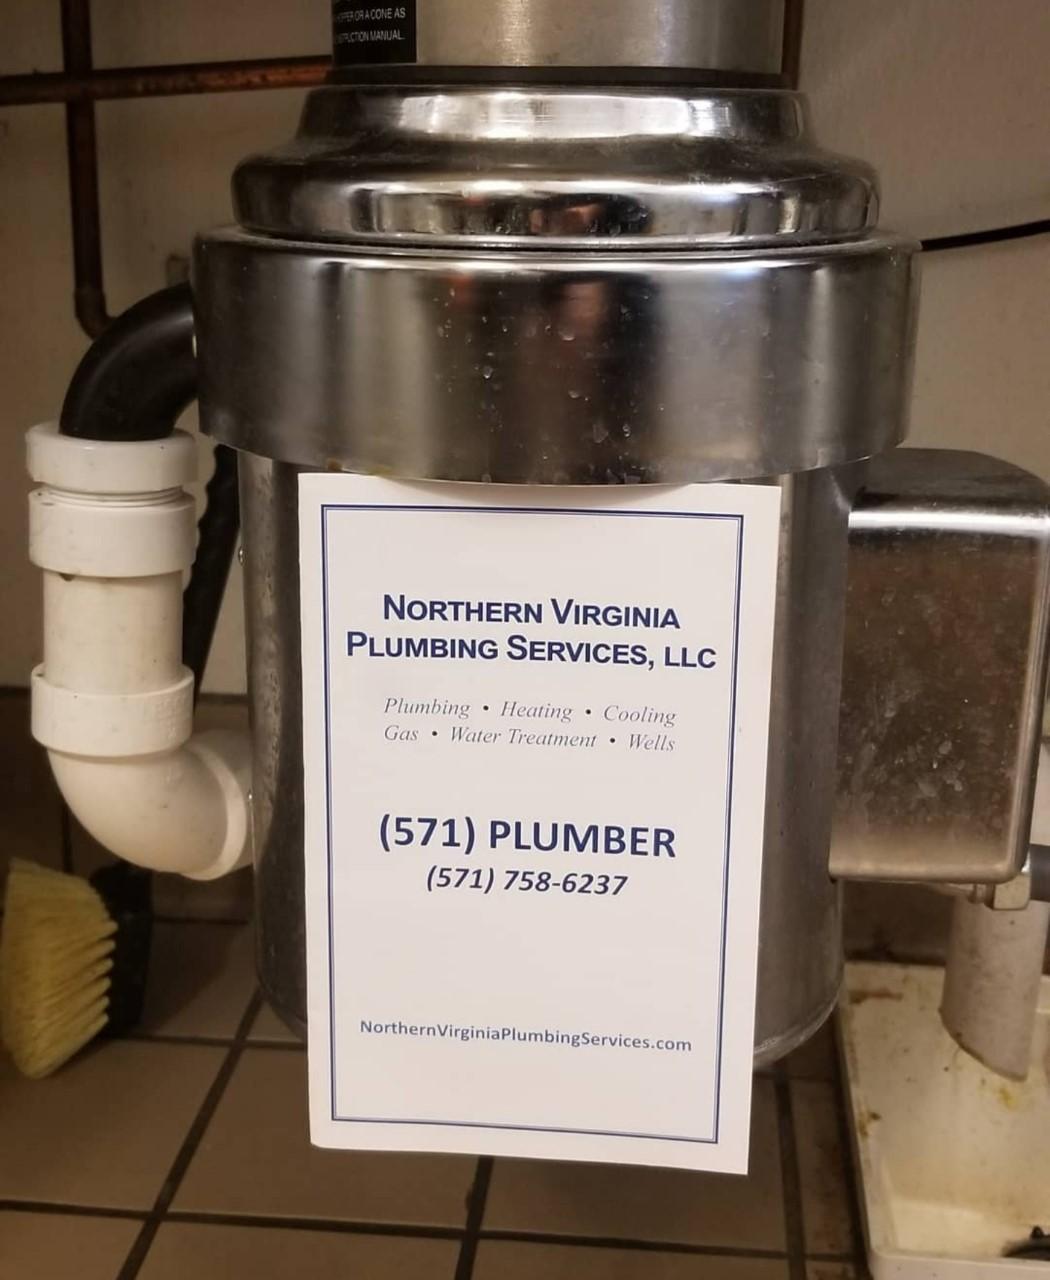 NORTHERN VIRGINIA PLUMBING SERVICES (64)